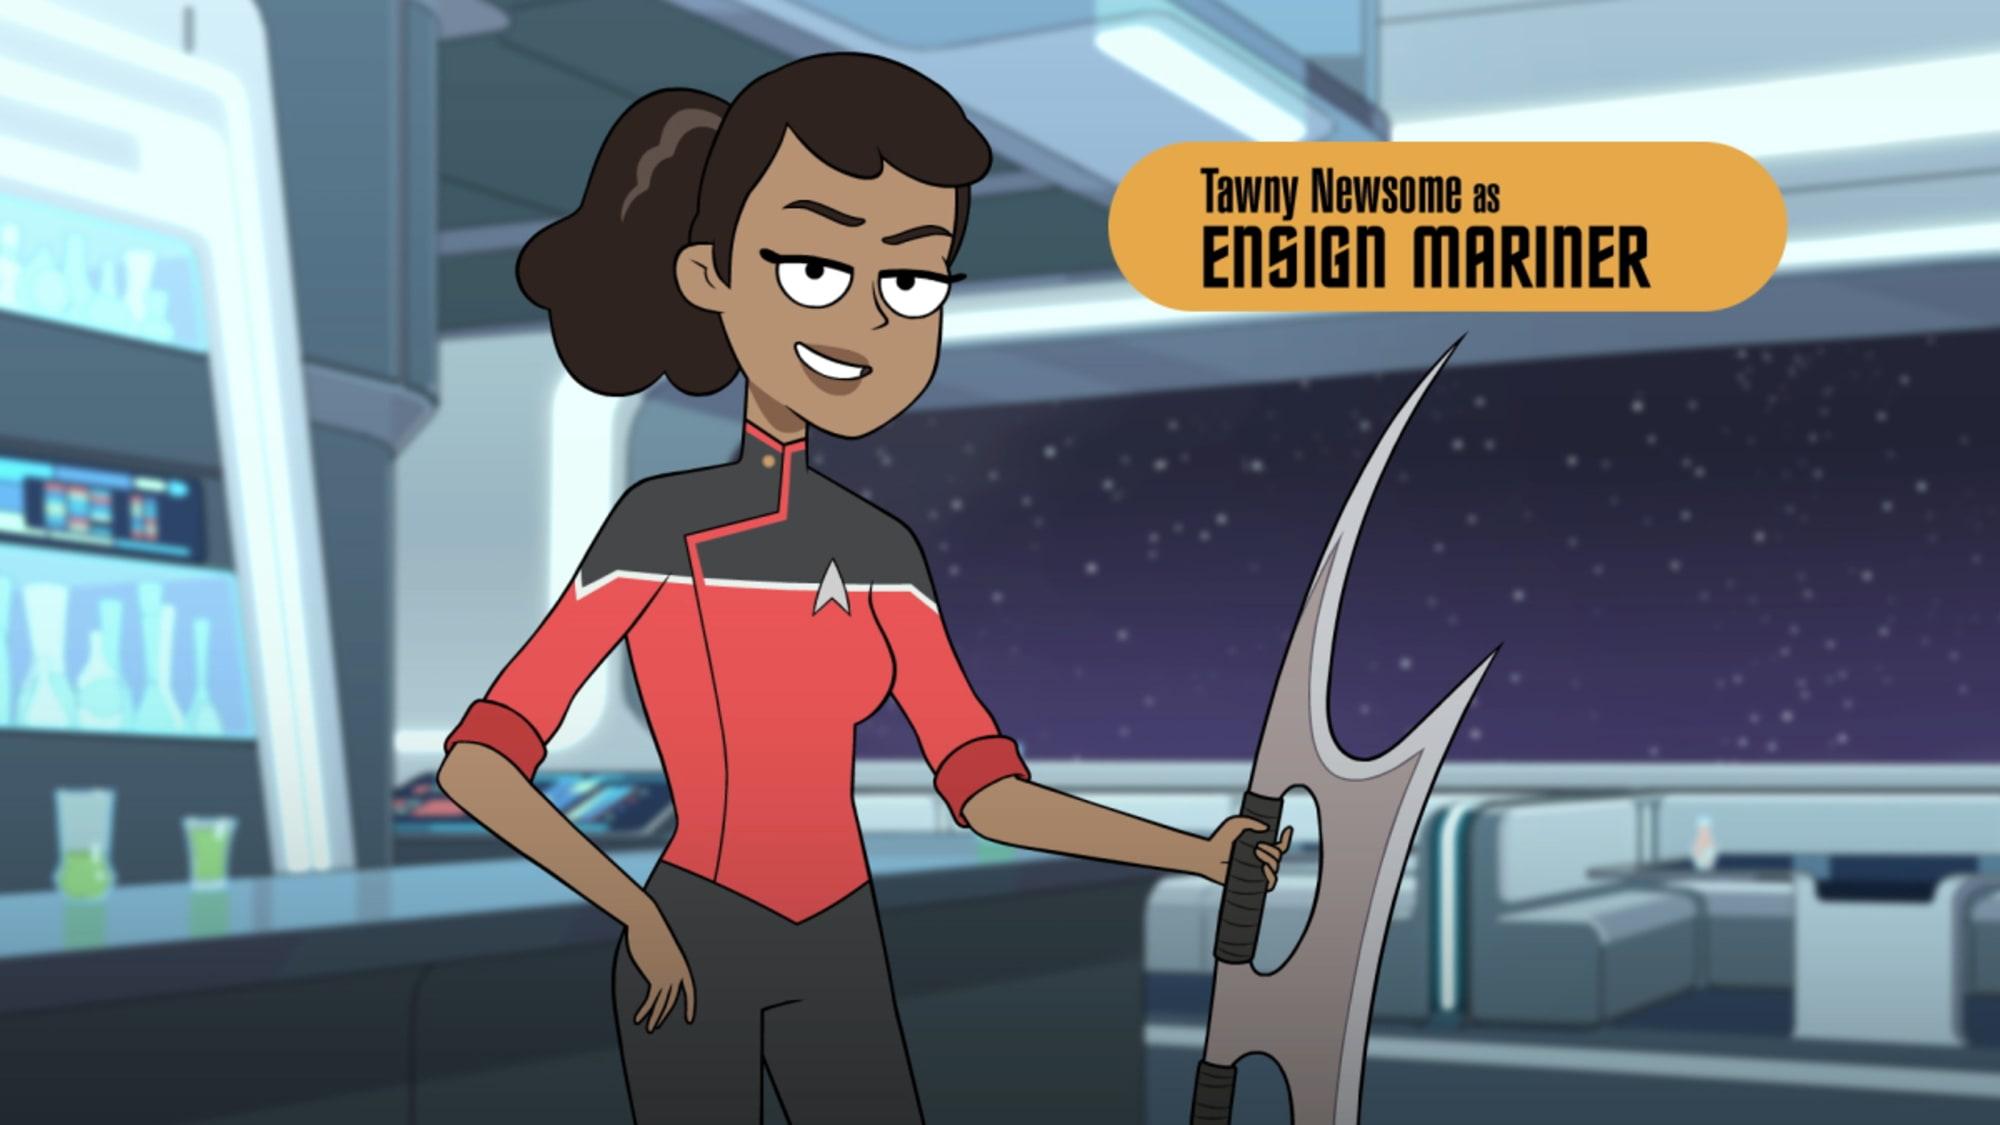 Star Trek: Lower Decks is even worse after giving it a second chance